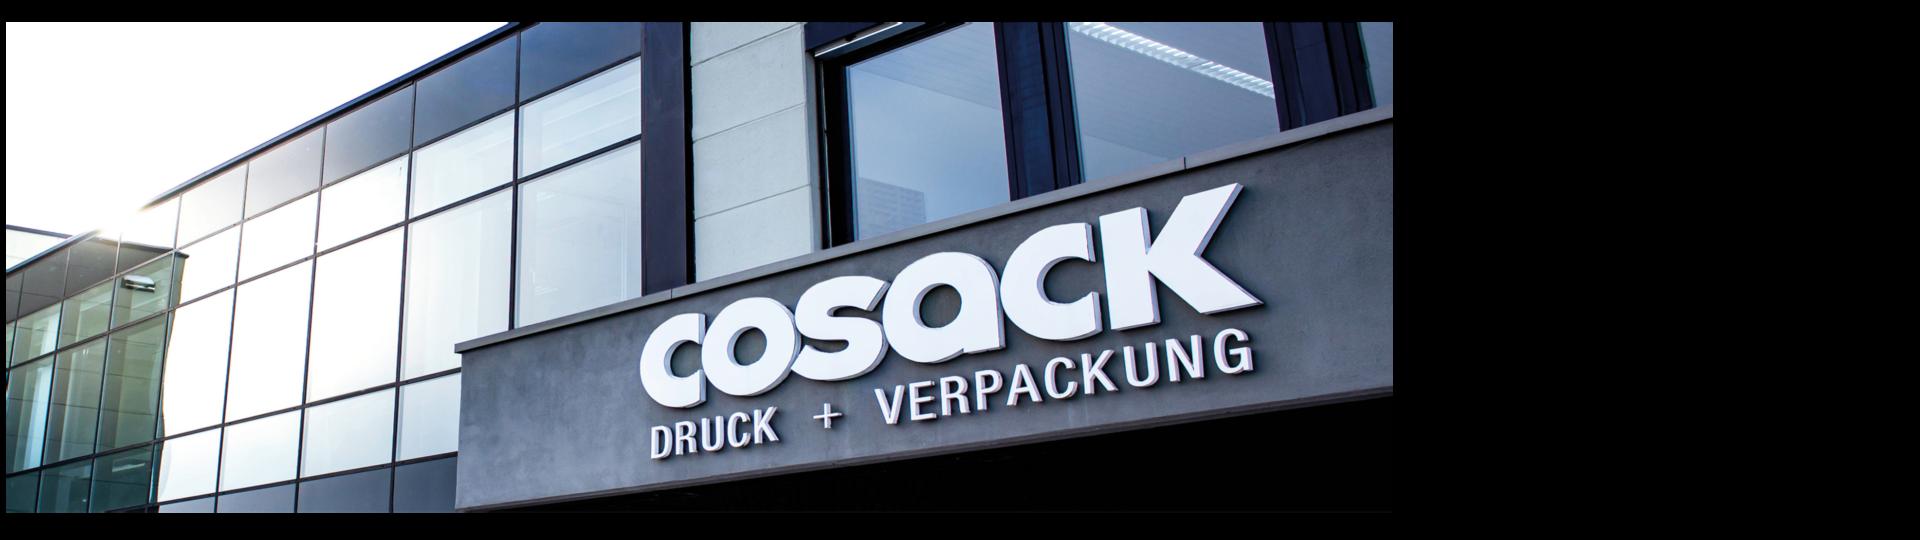 Cosack GmbH & Co. KG